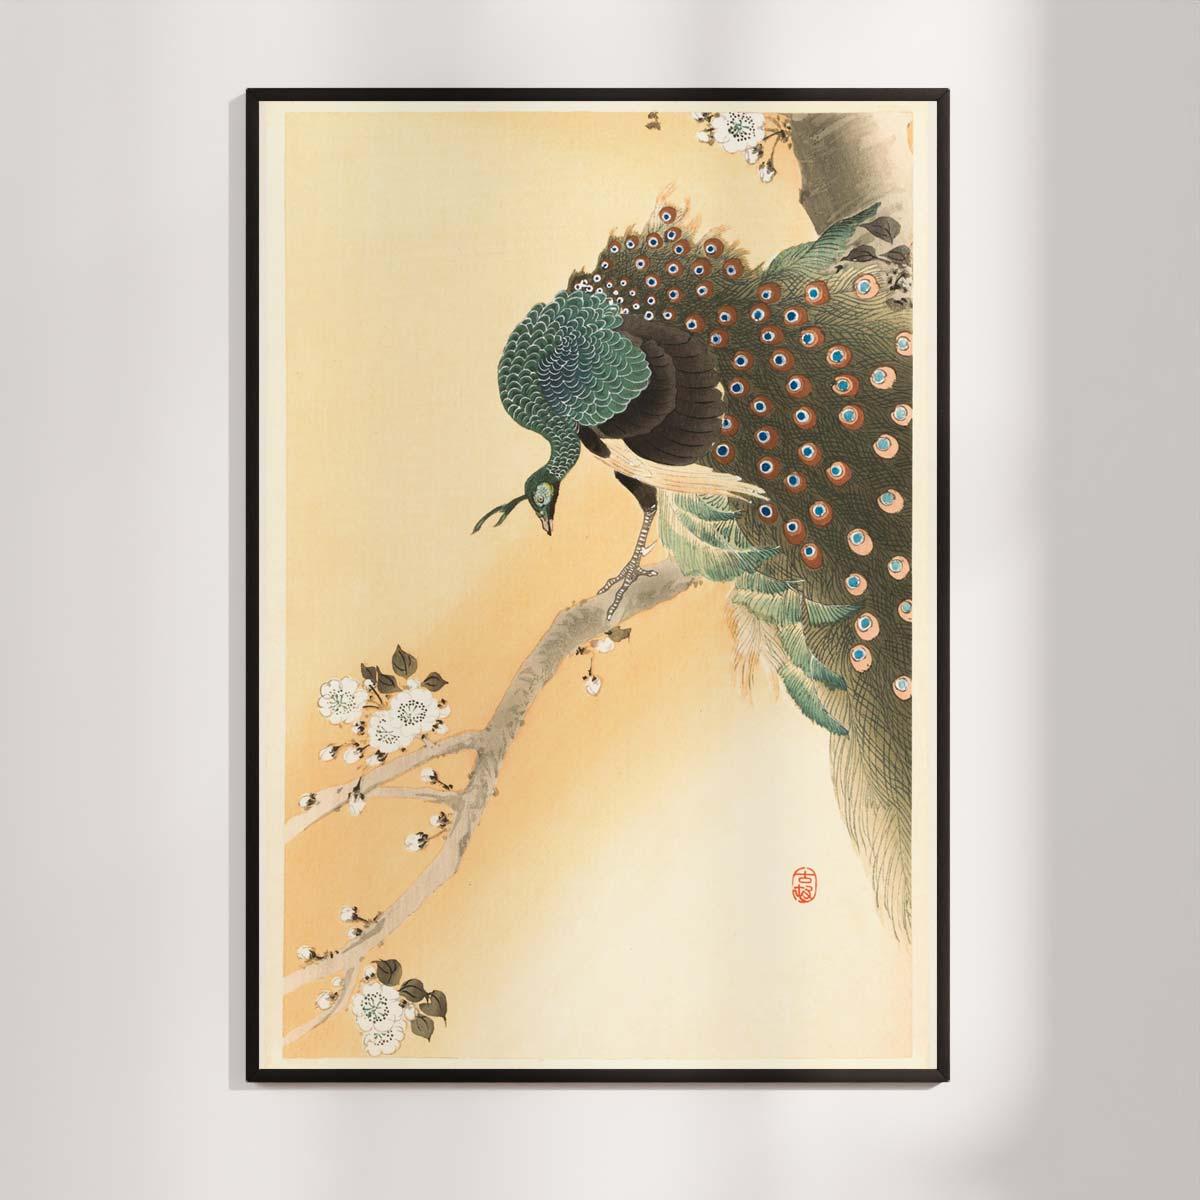 Plakat - Japansk Træsnit - Påfugl i kirsebærtræ - Ohara Koson